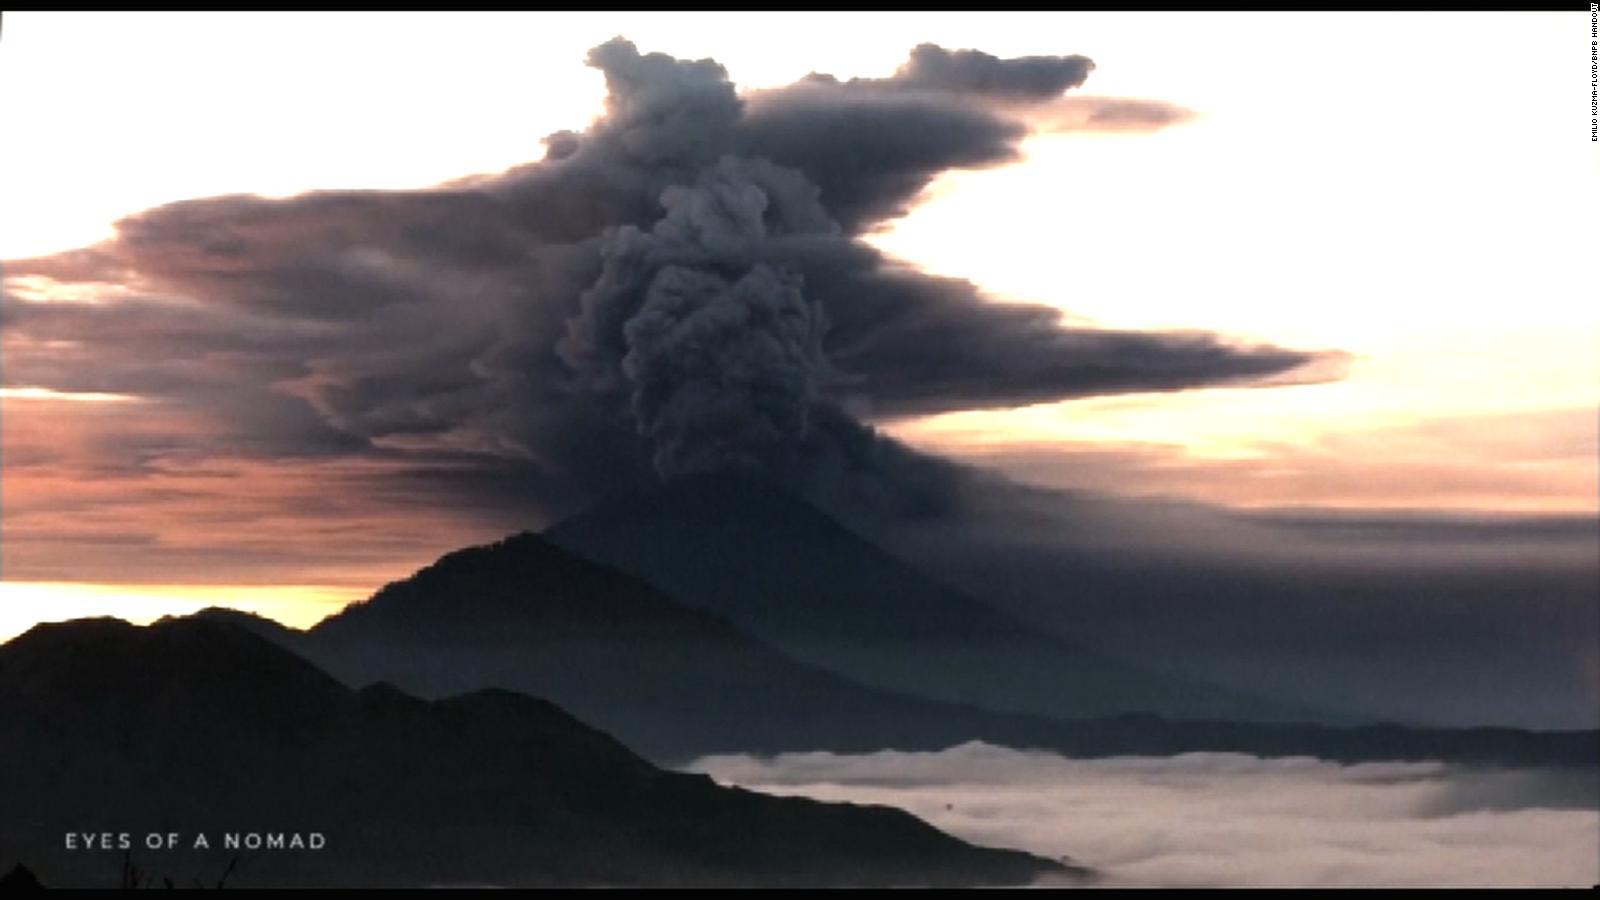 Aeroporto Bali : Bali volcano ngurah rai airport reopens after days of uncertainty